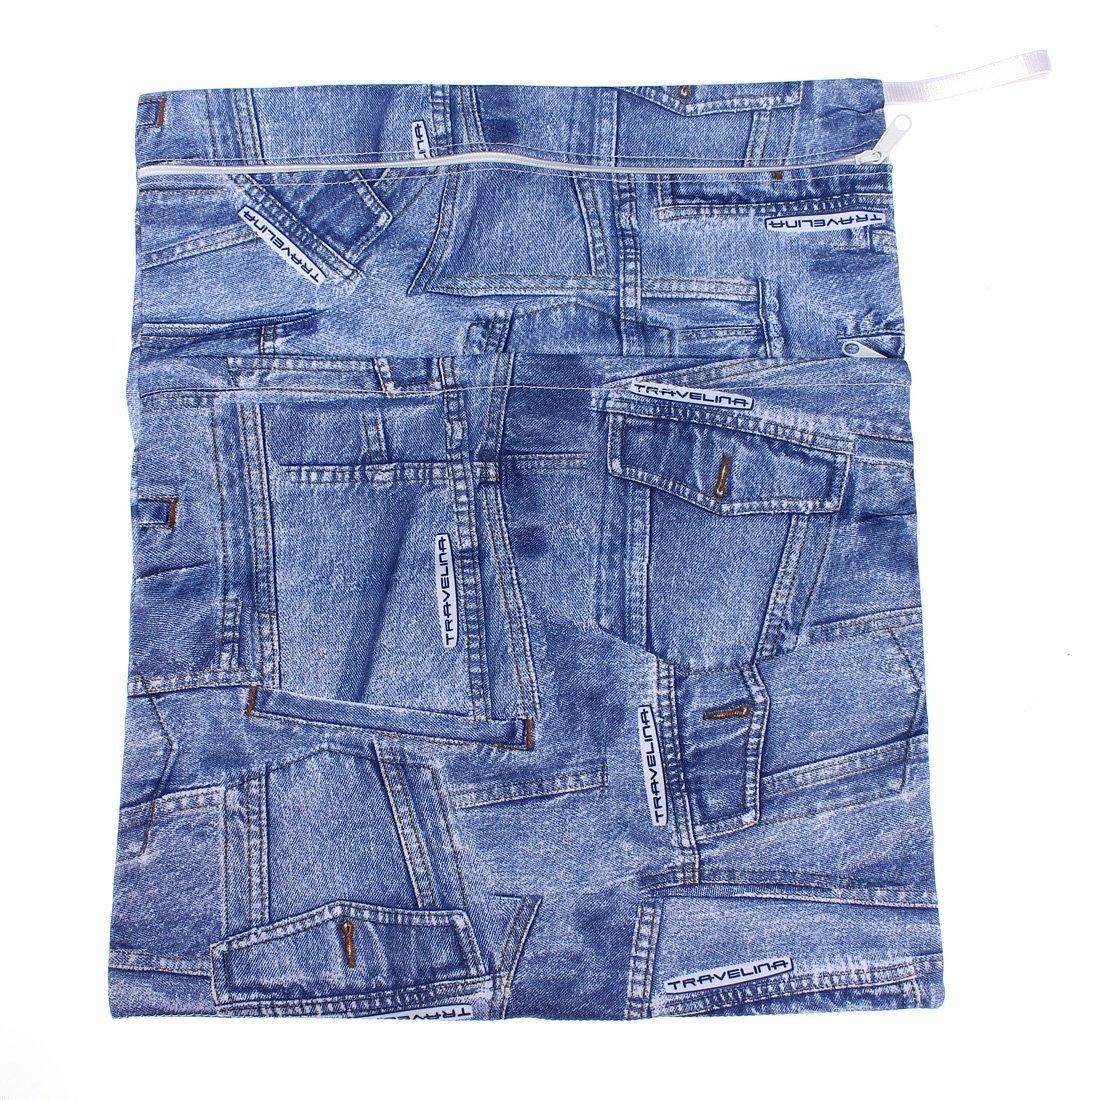 Baby Infant Waterproof Zipper Reusable Cloth Diaper Bag (.cowboys colors) BabyCentre SHOMPFL1379